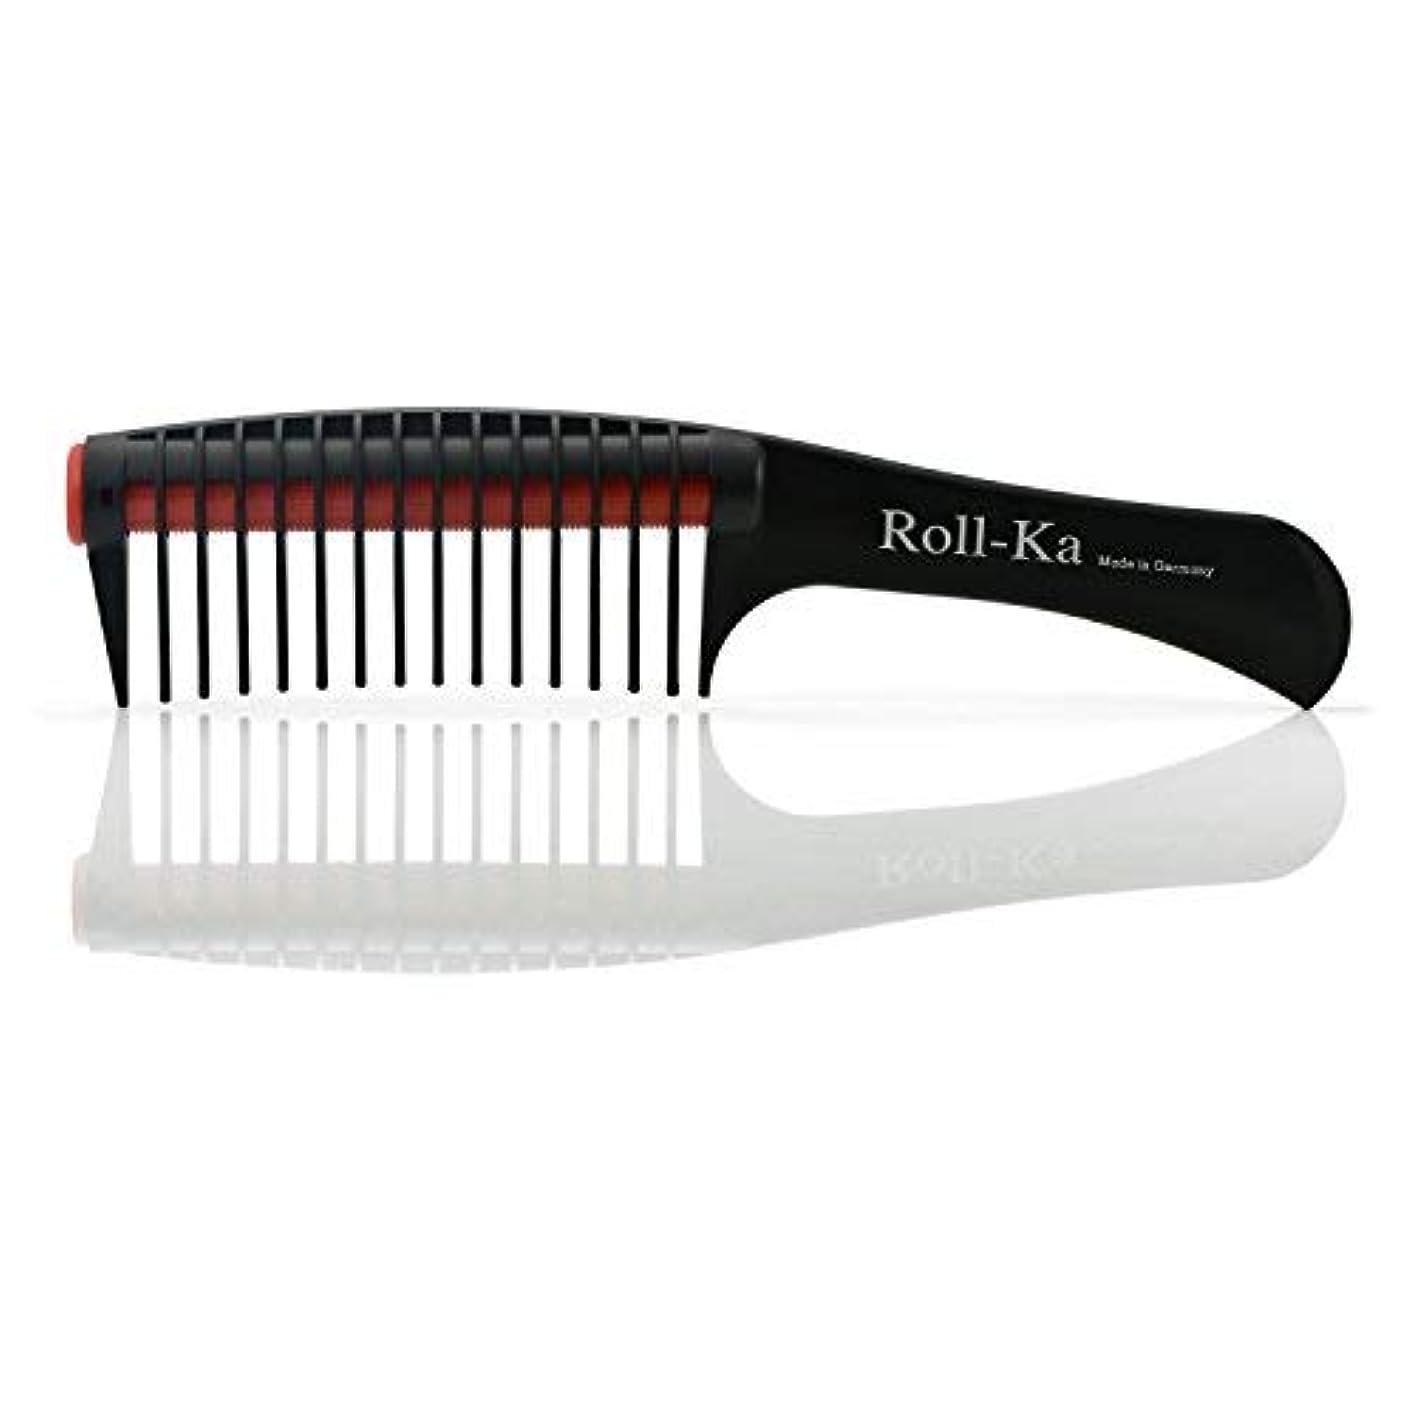 欠乏敗北美徳Triumph Technic Roll-Ka Anti Splicing Hair Comb 9